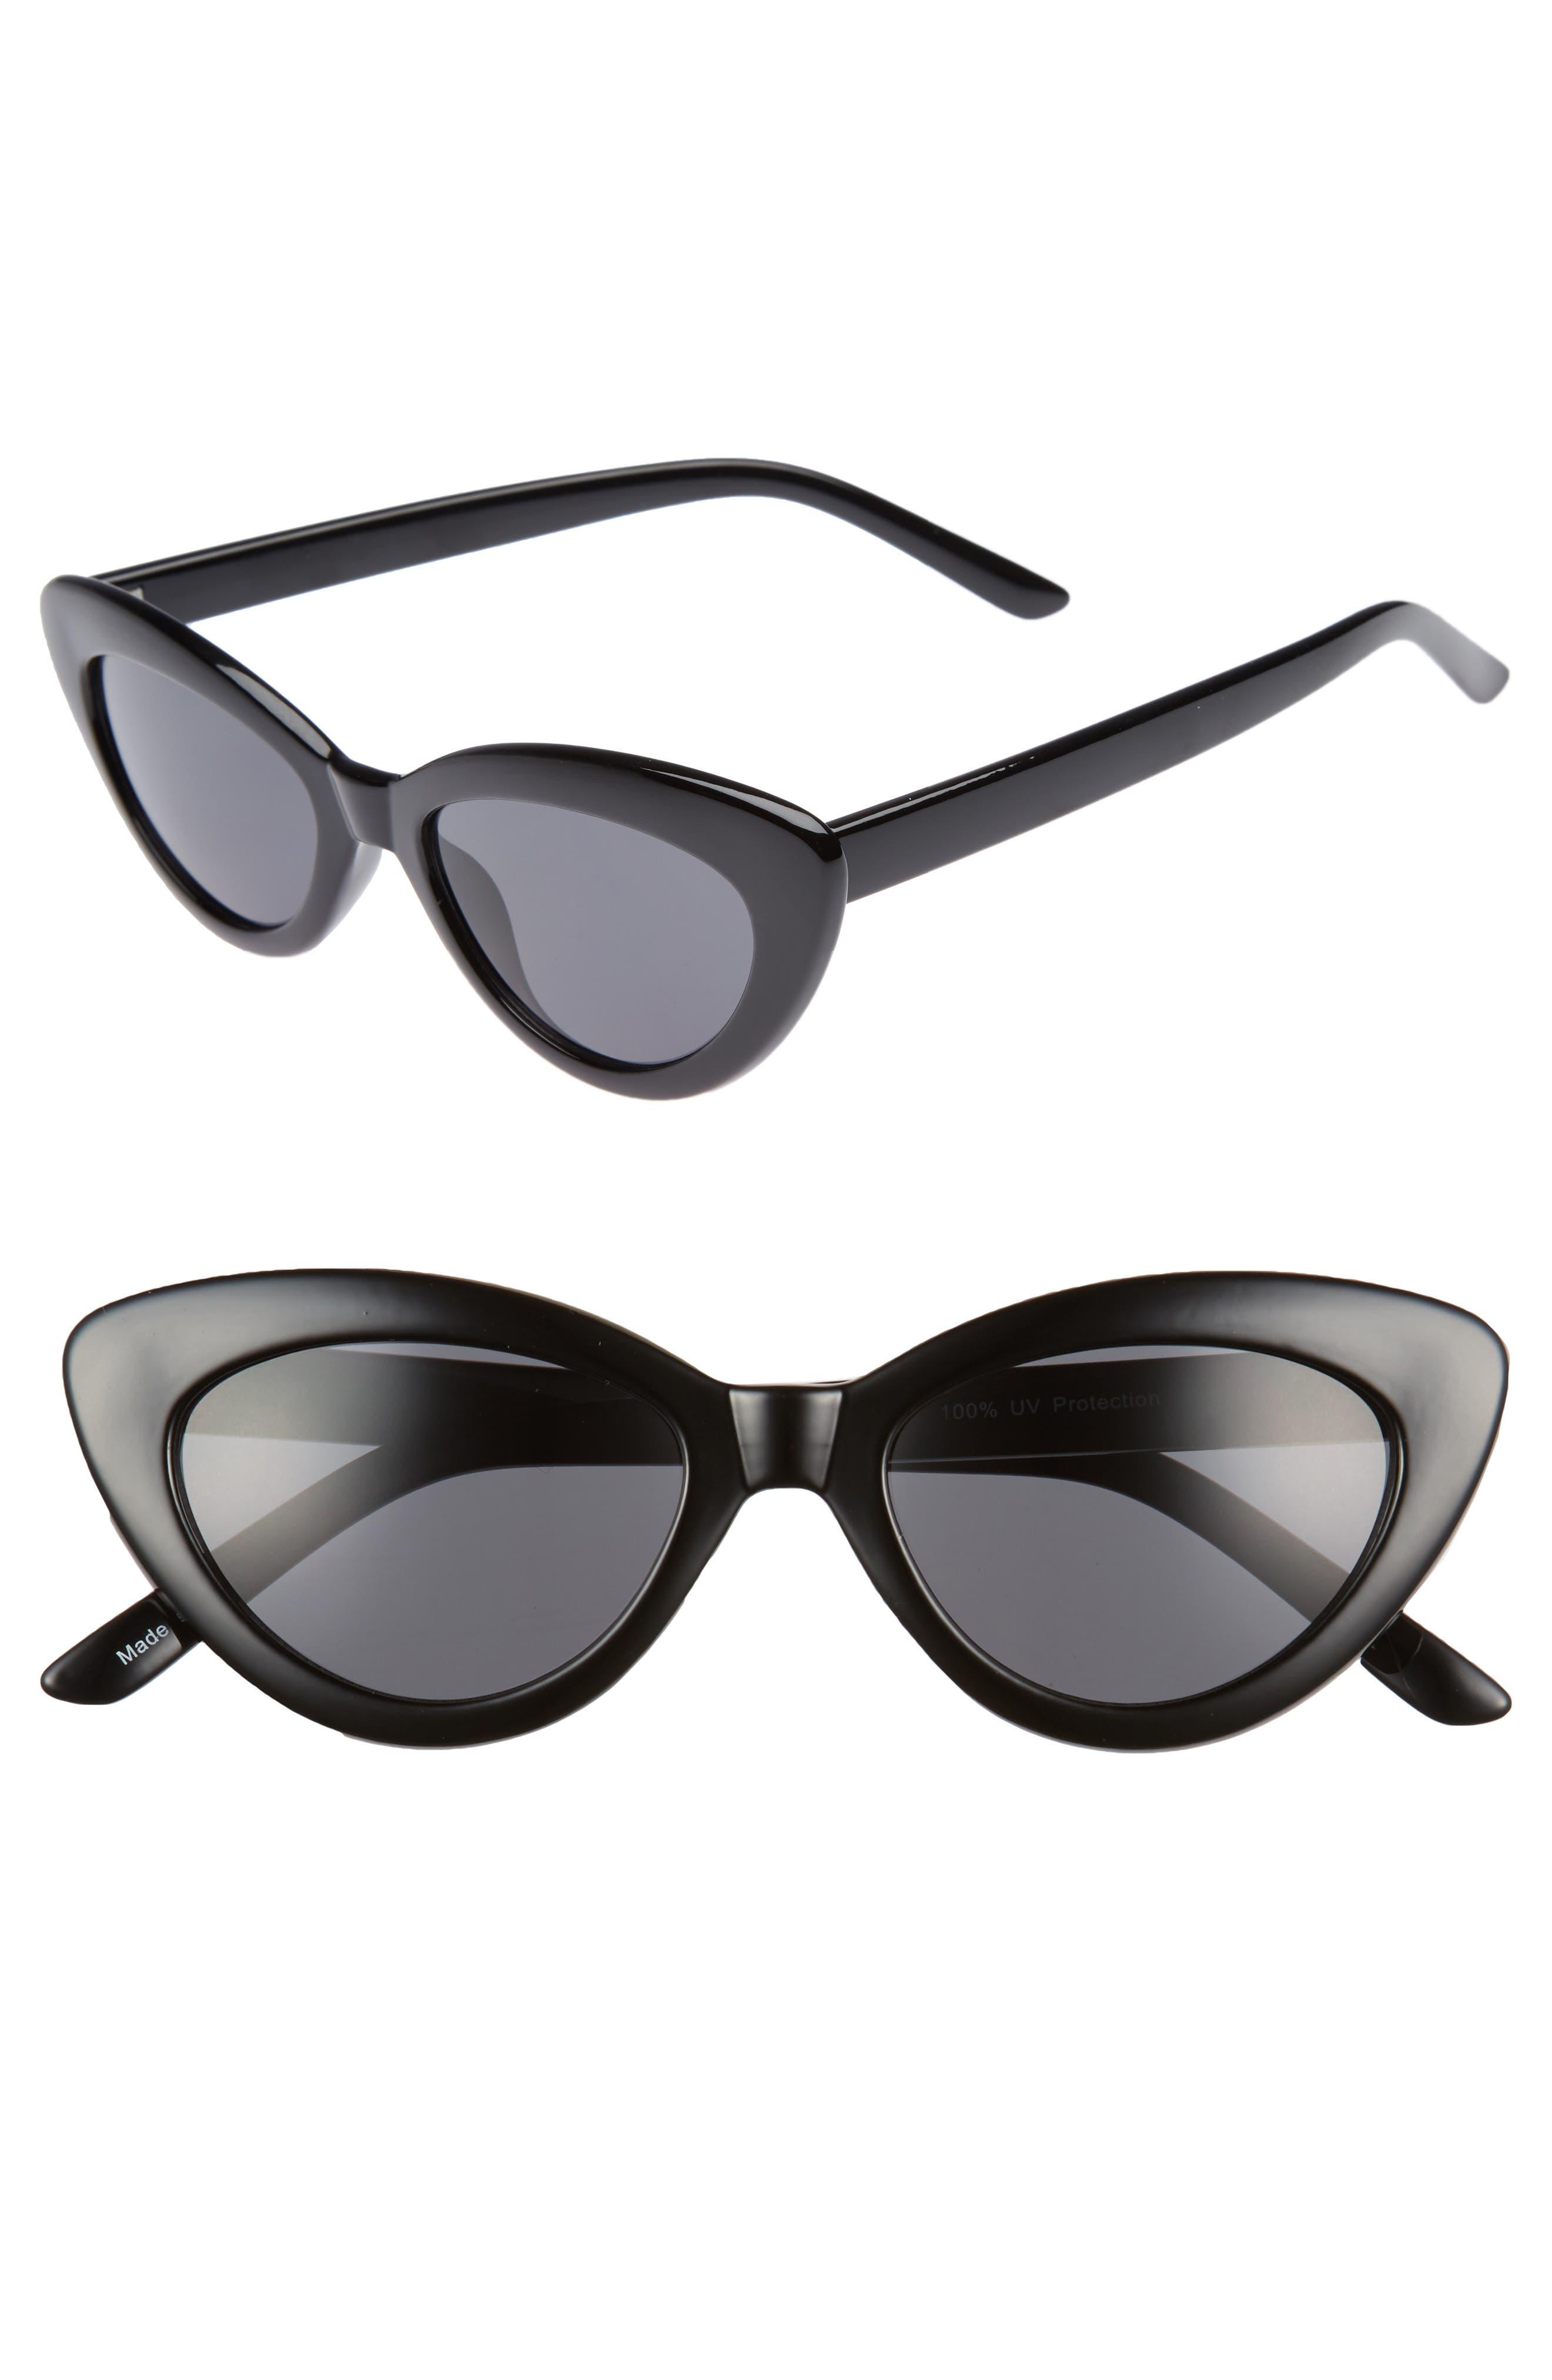 51mm Mini Cat Eye Sunglasses,                             Main thumbnail 1, color,                             001